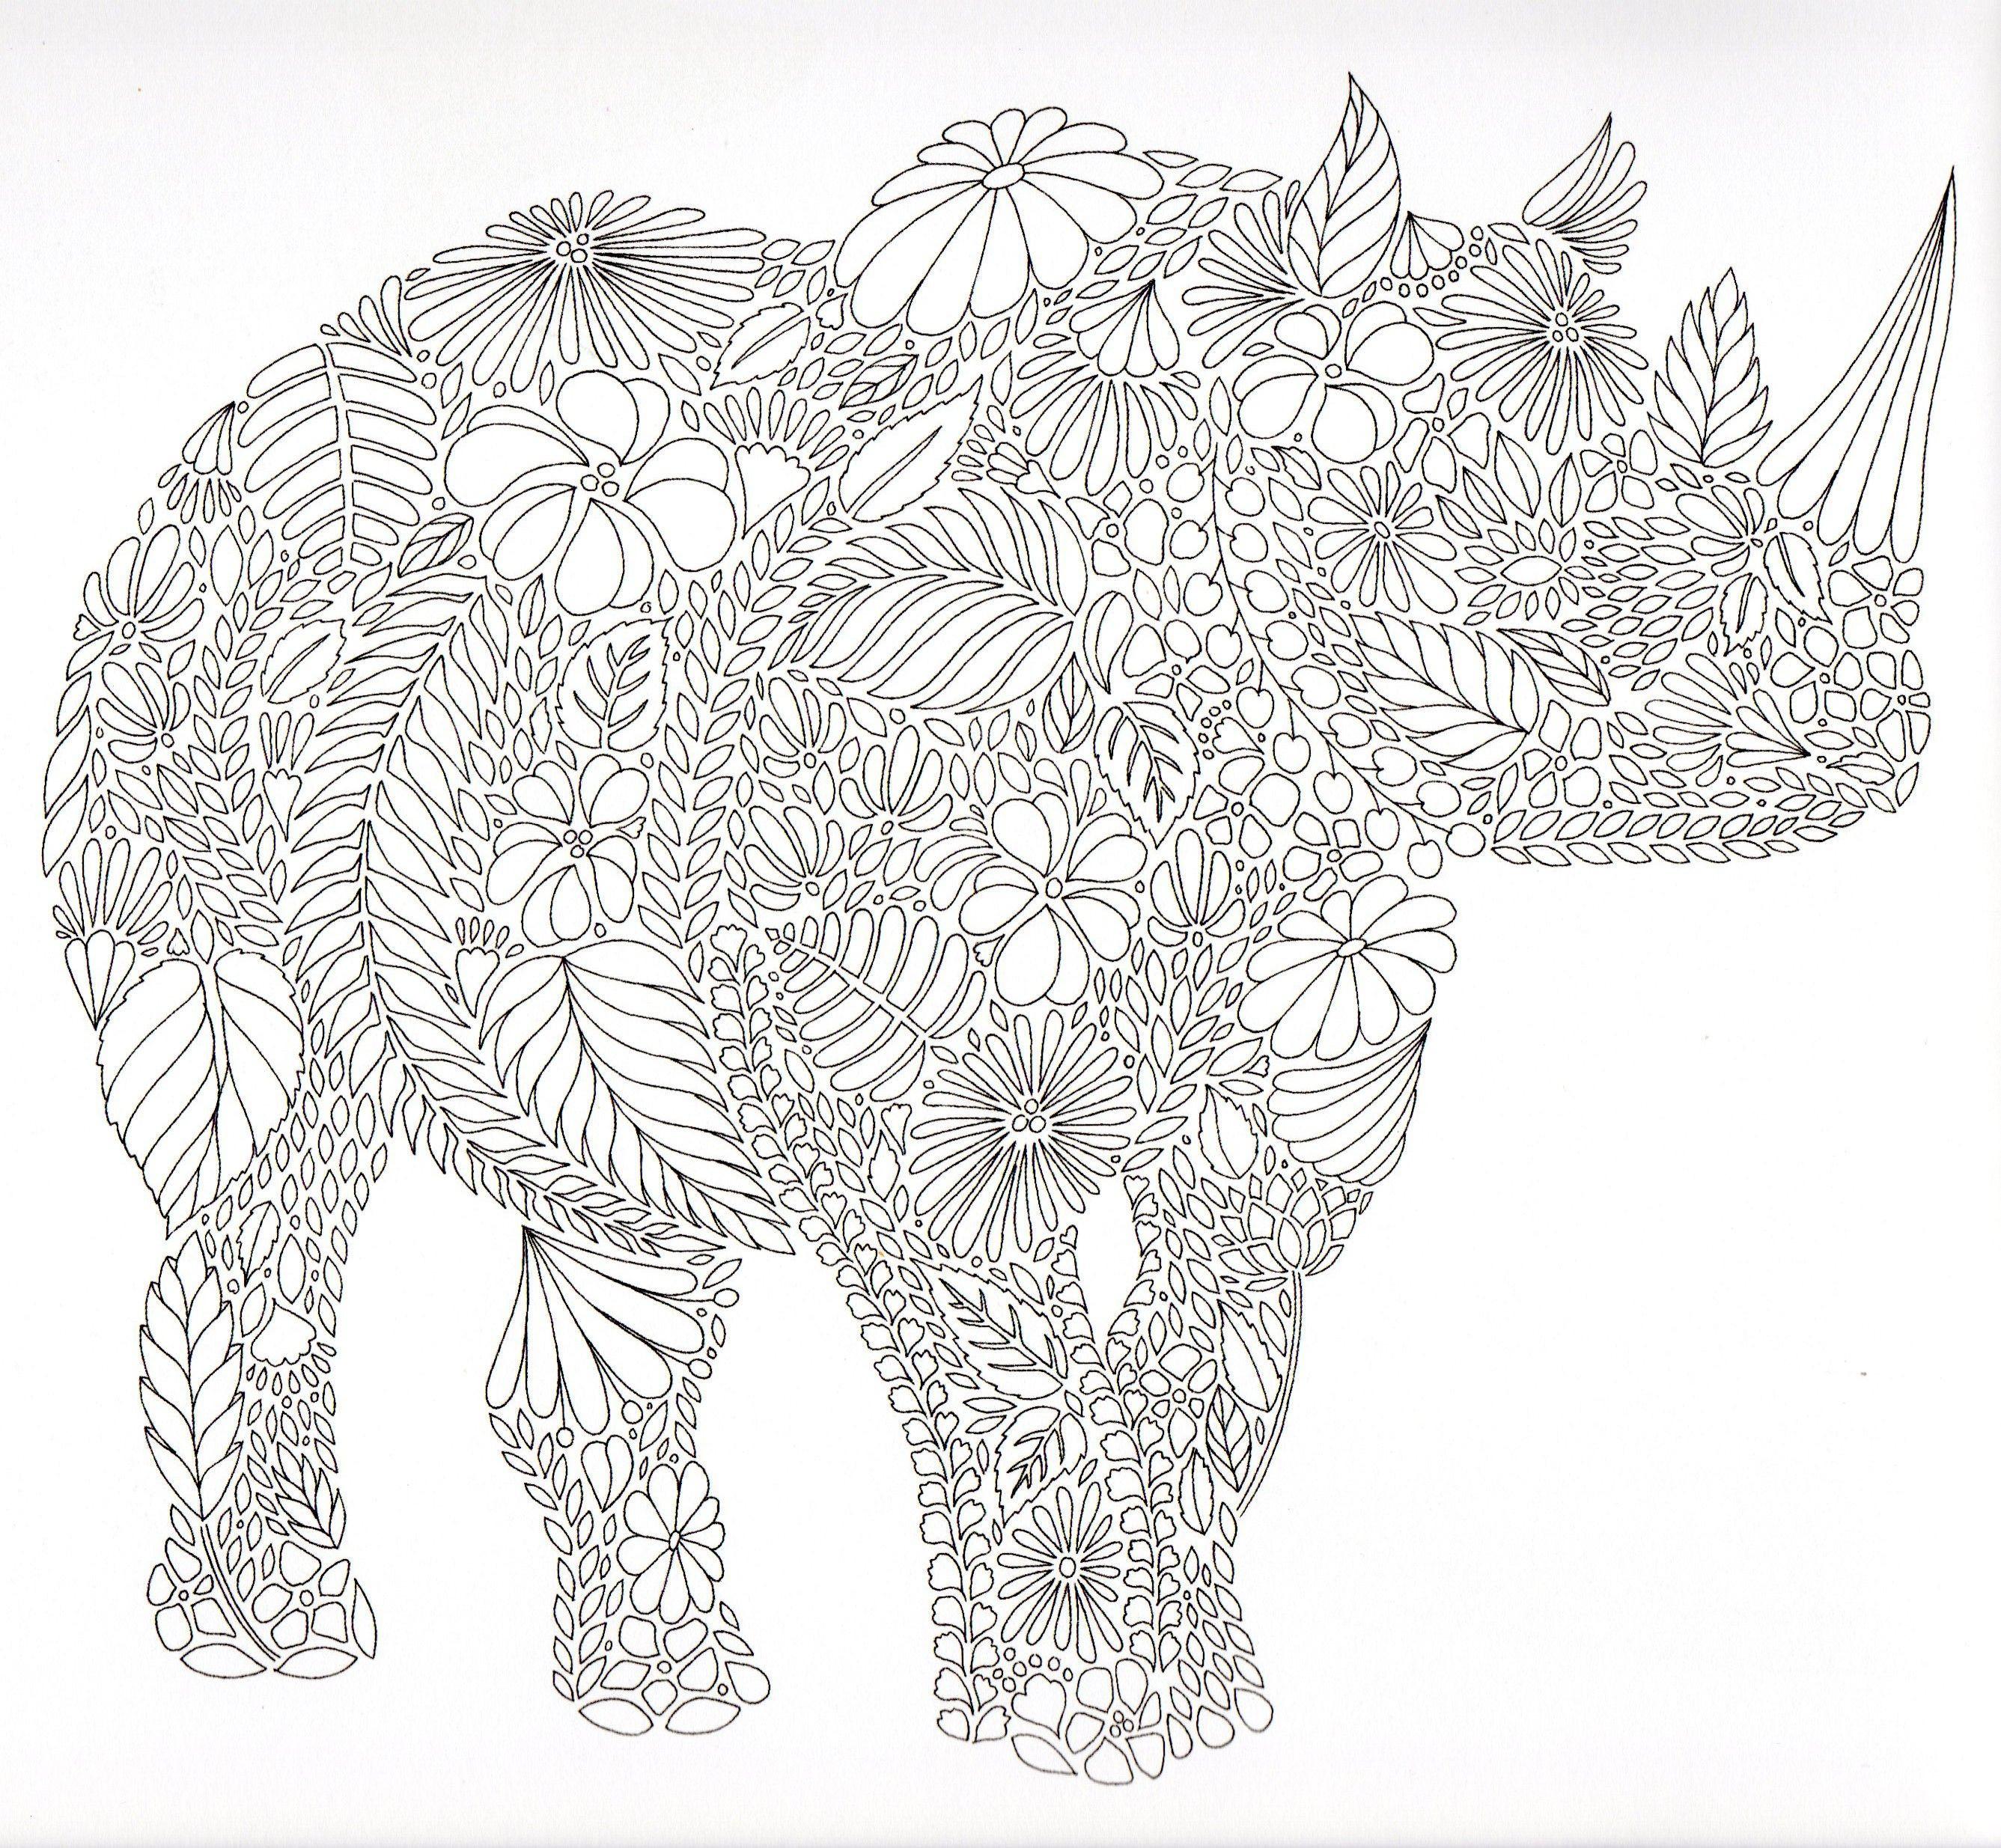 Mandalas Zum Ausdrucken Herzen Neu Mandala Nashorn Ausmalbilder Pinterest Frisch Malvorlagen Erwachsene Stock